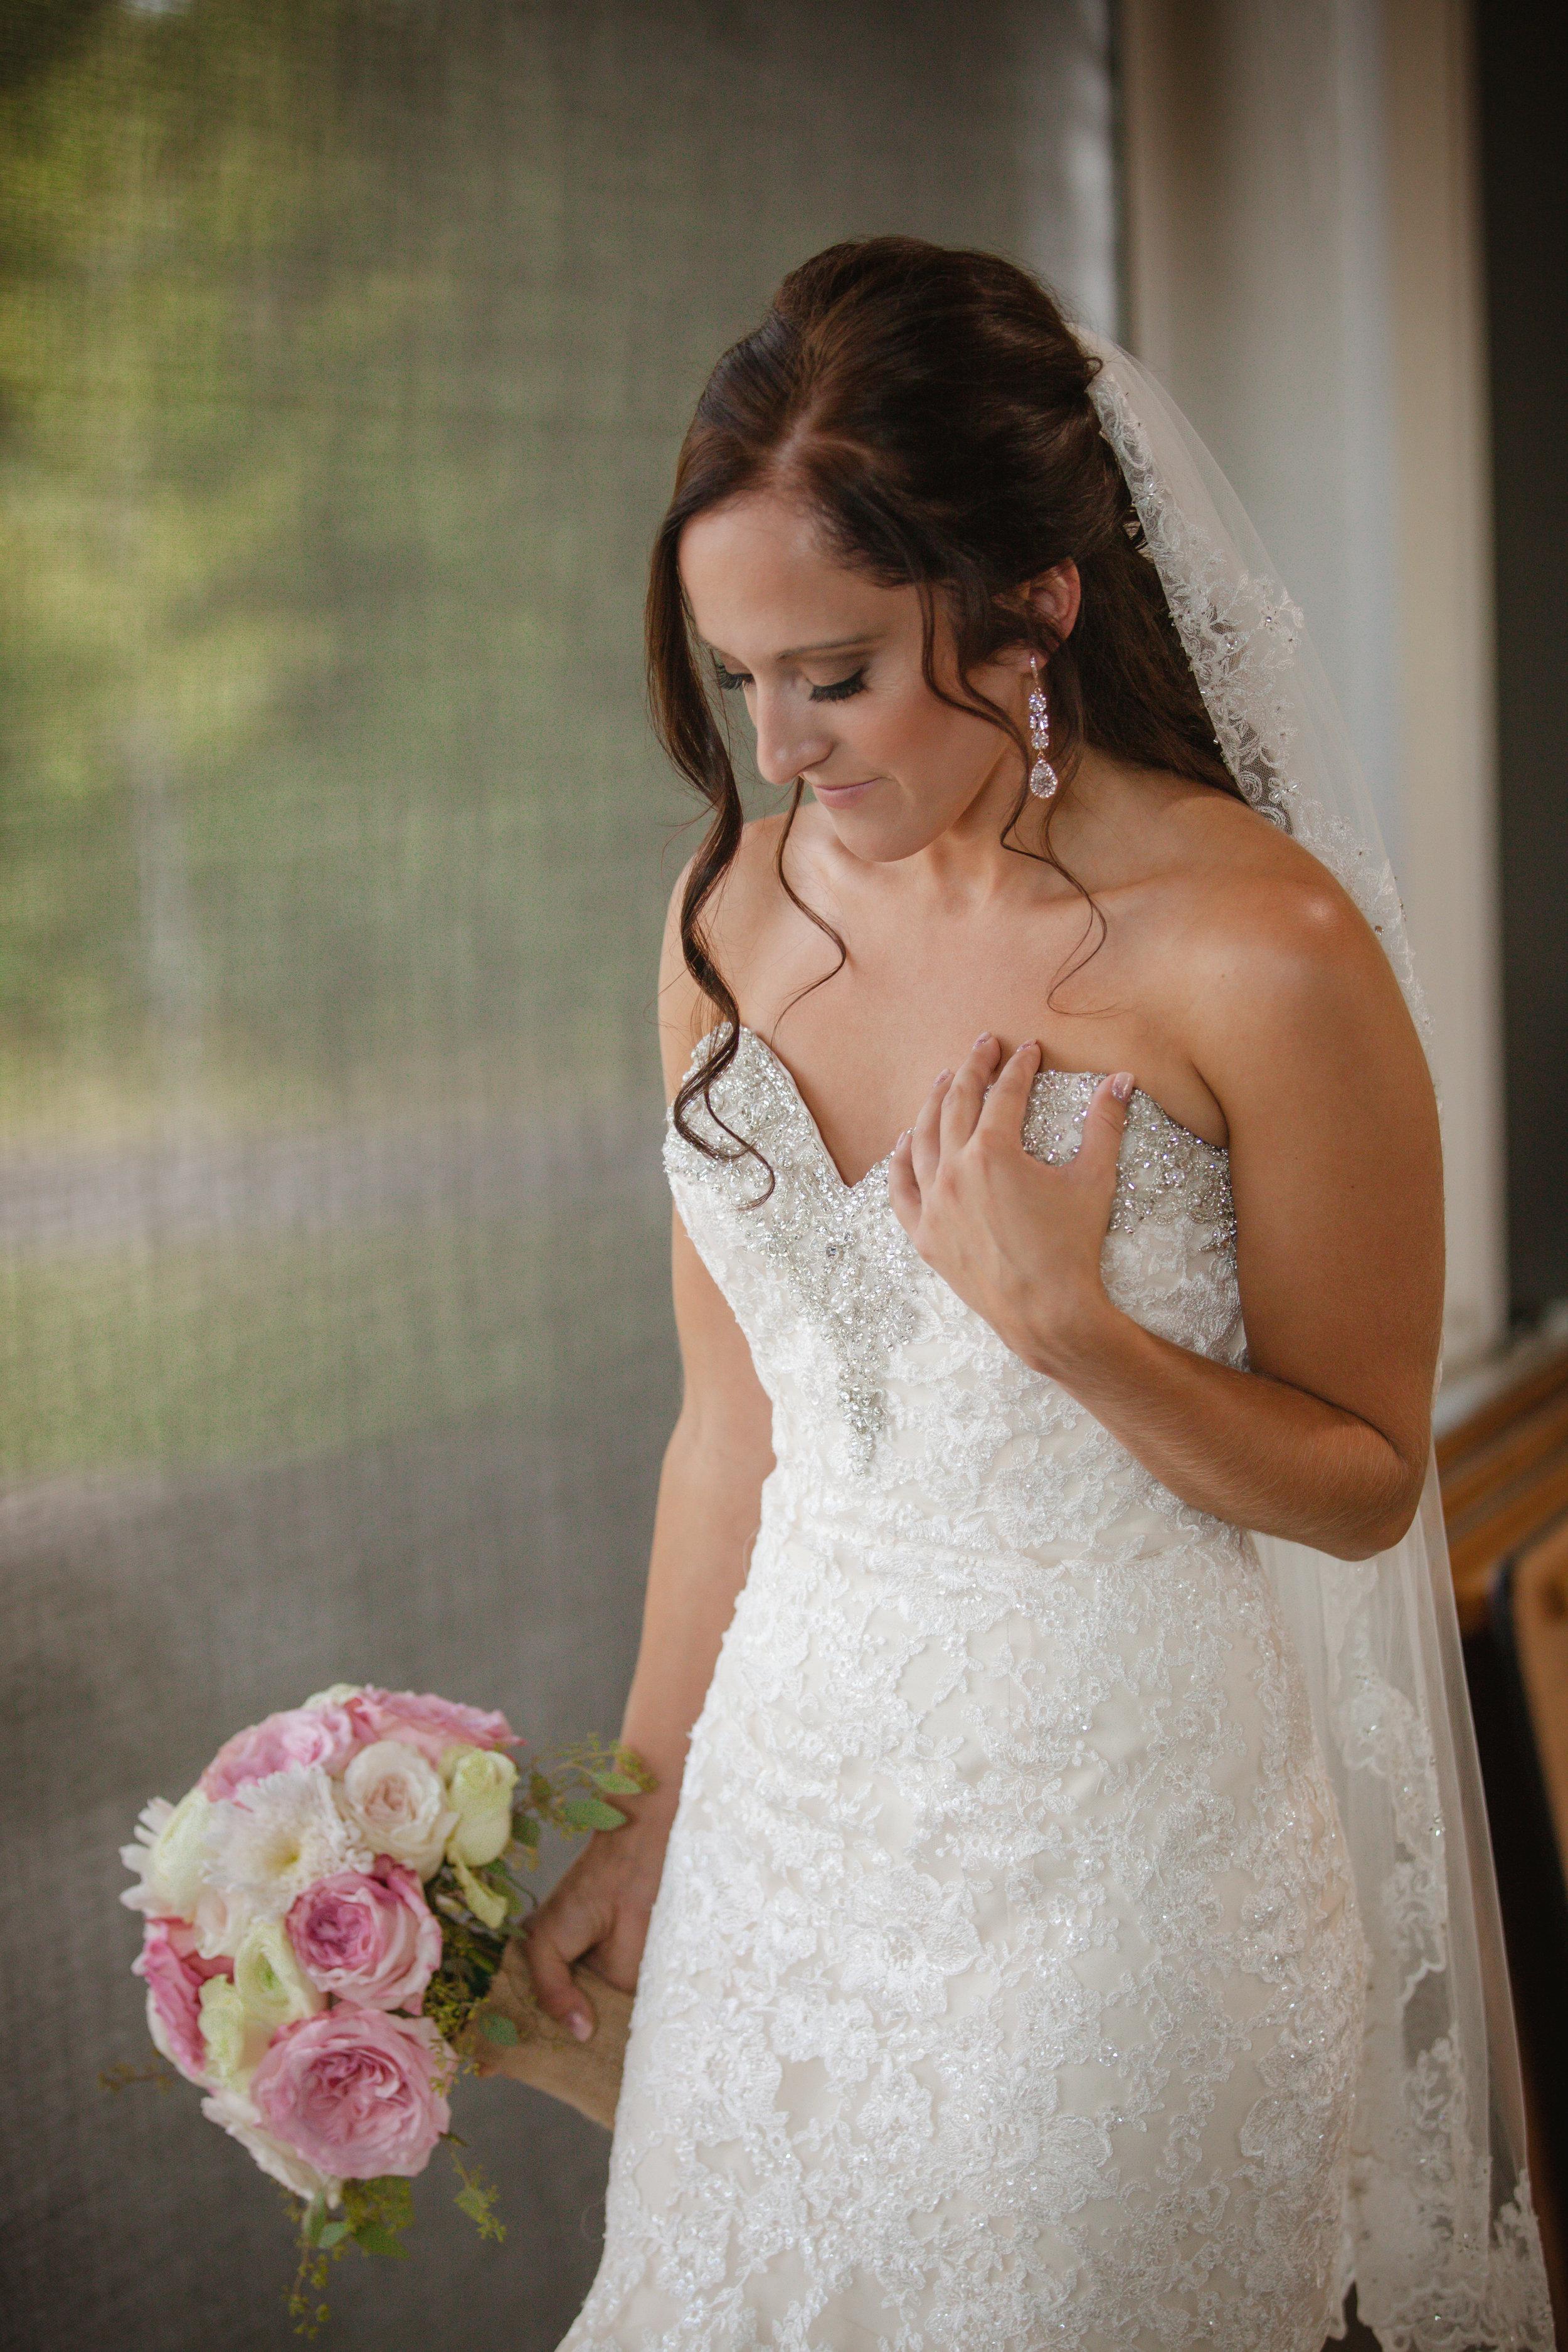 Focus Photography: Weddings